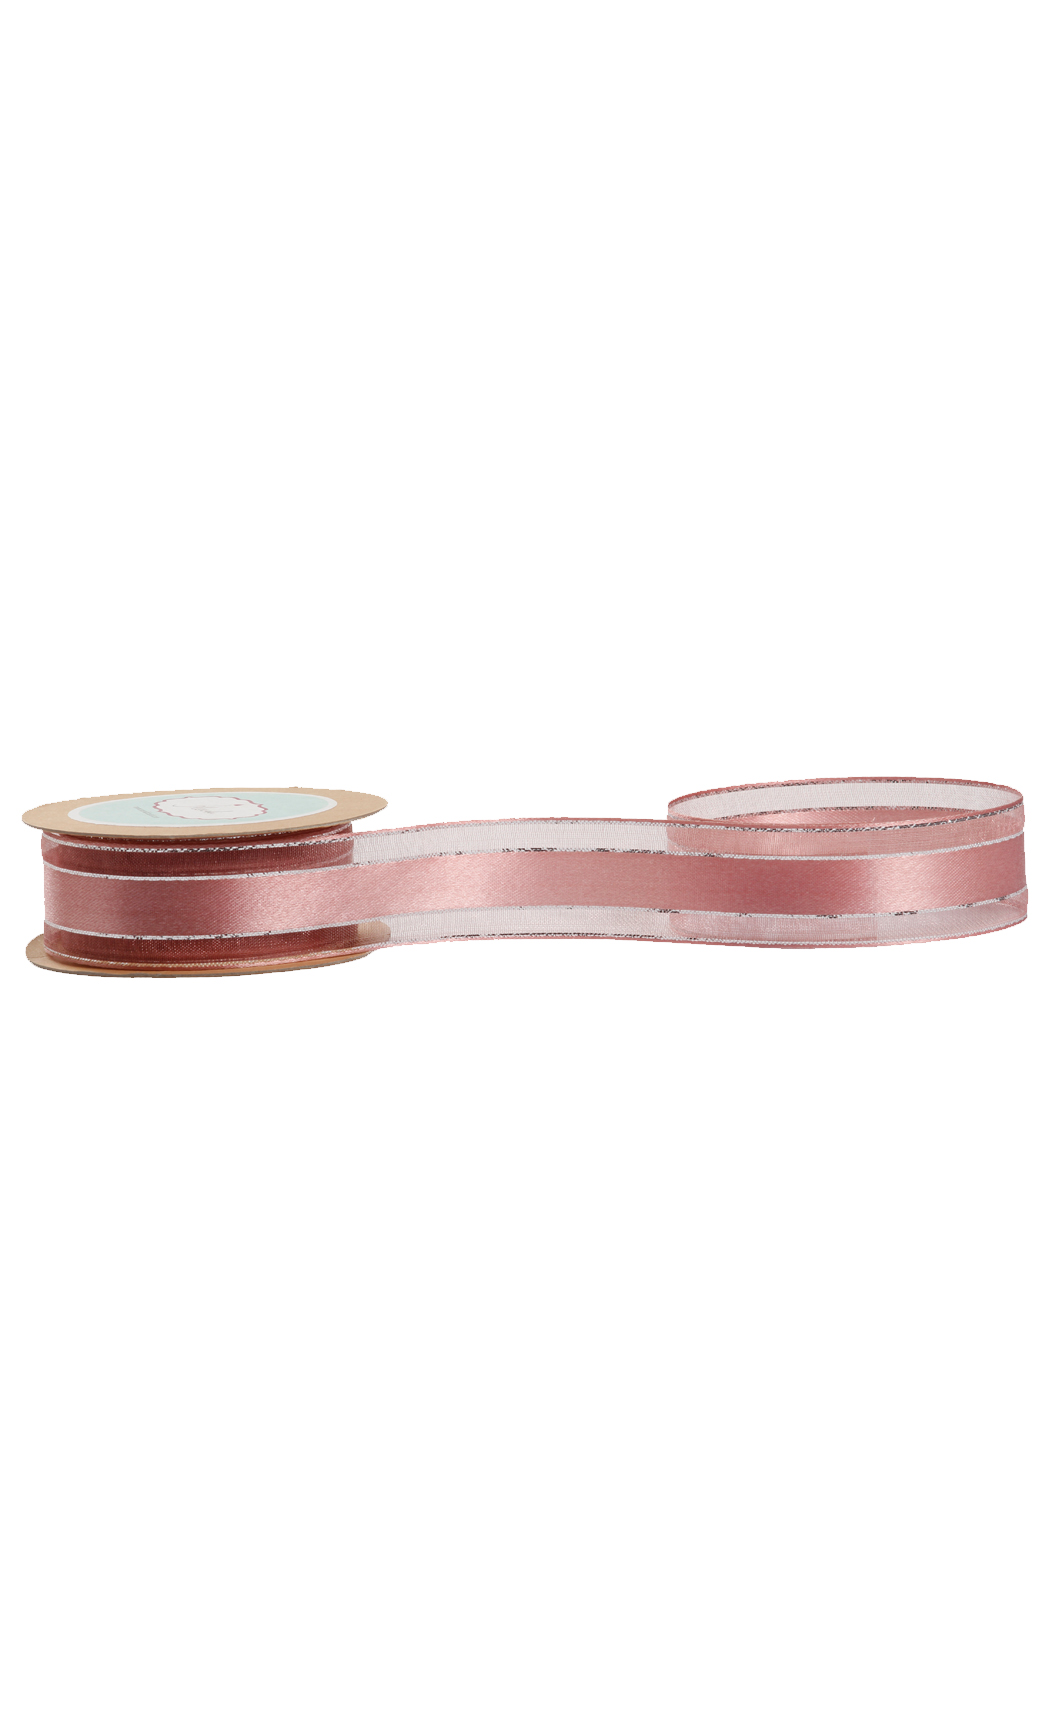 Dirty Rose Pink Sheer-Satin Ribbon - Buy Online